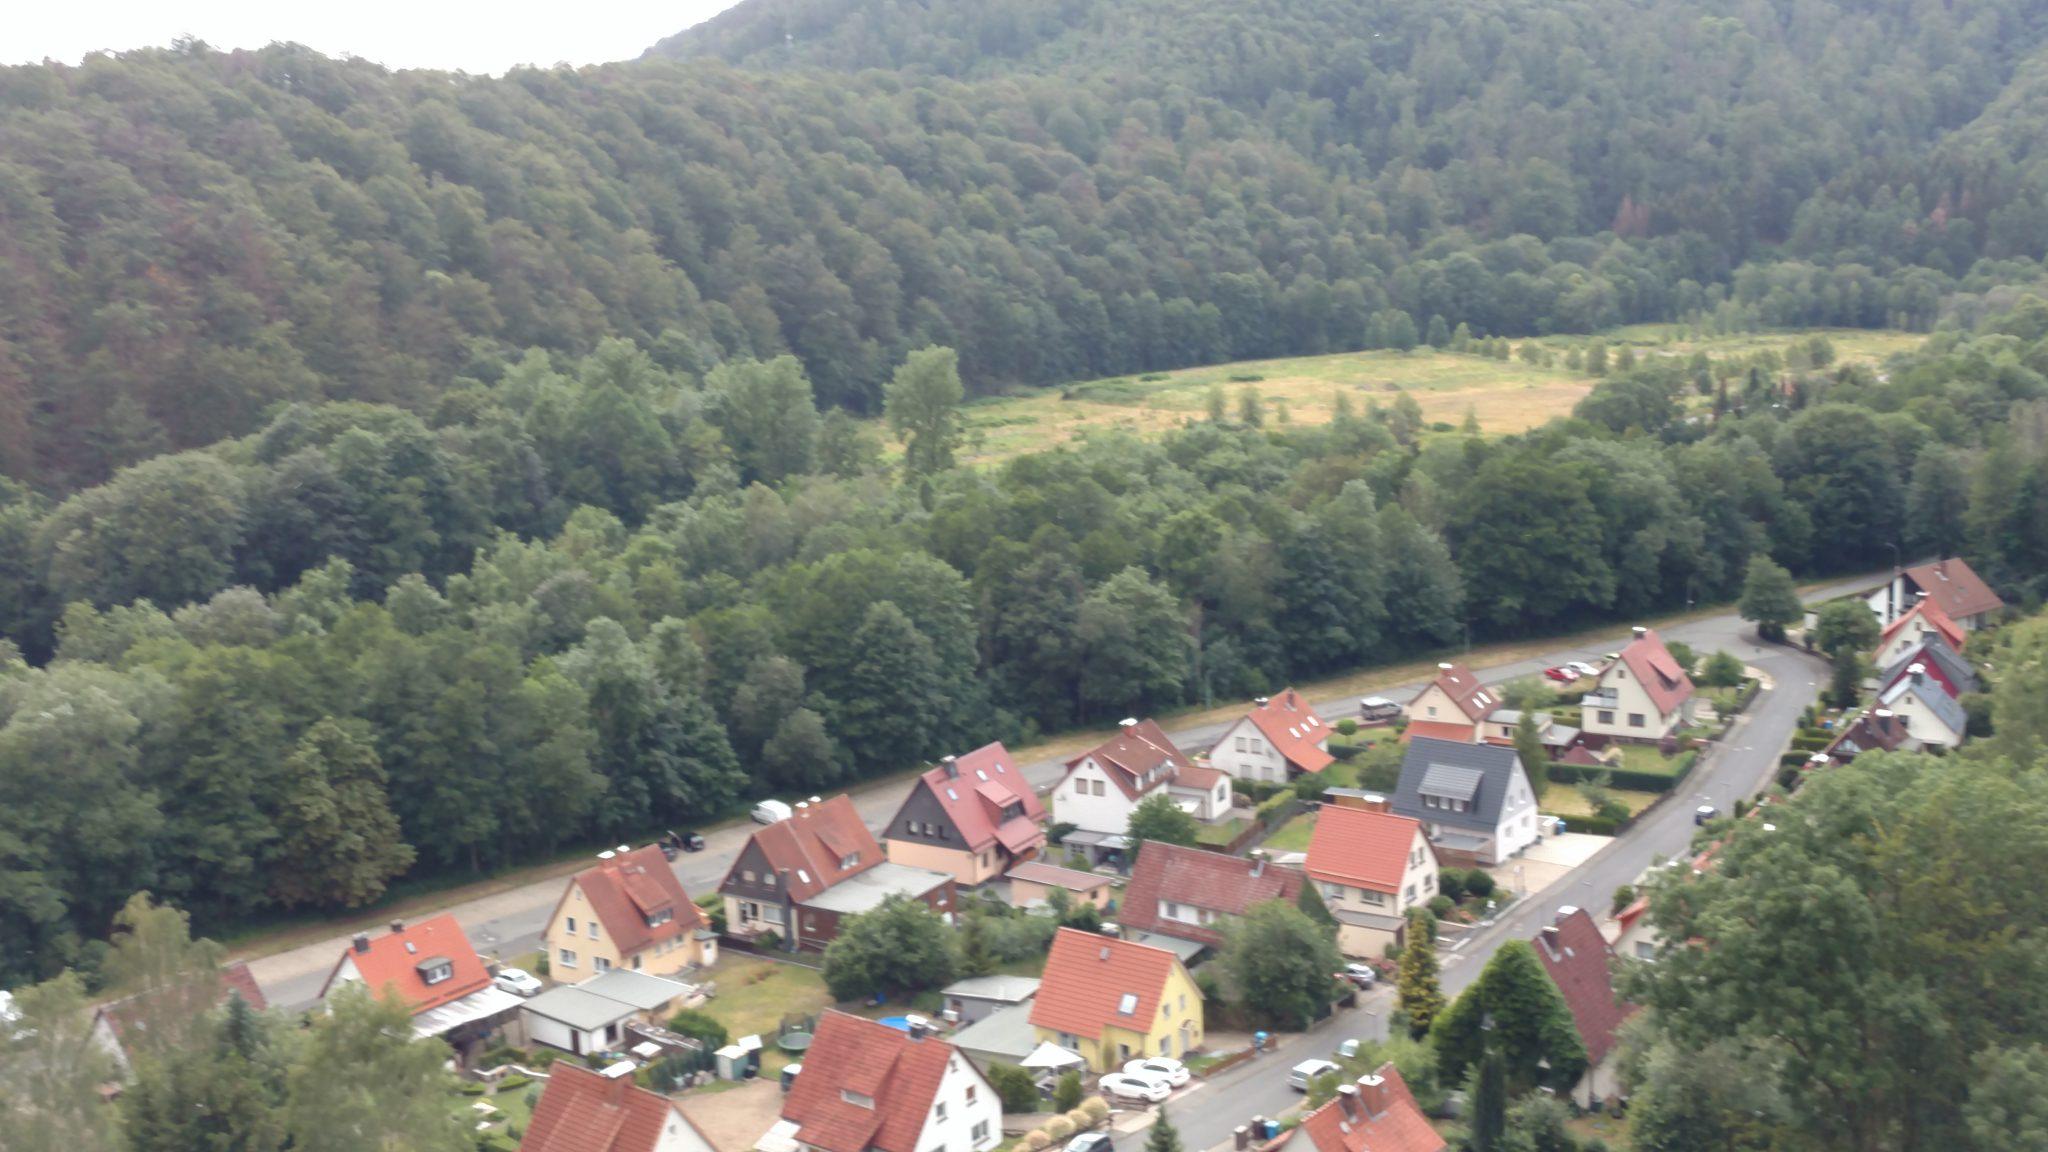 Review: Aparthotel Panoramic Hotel in Bad Lauterberg Harz Duitsland met kinderen - Mamaliefde.nl